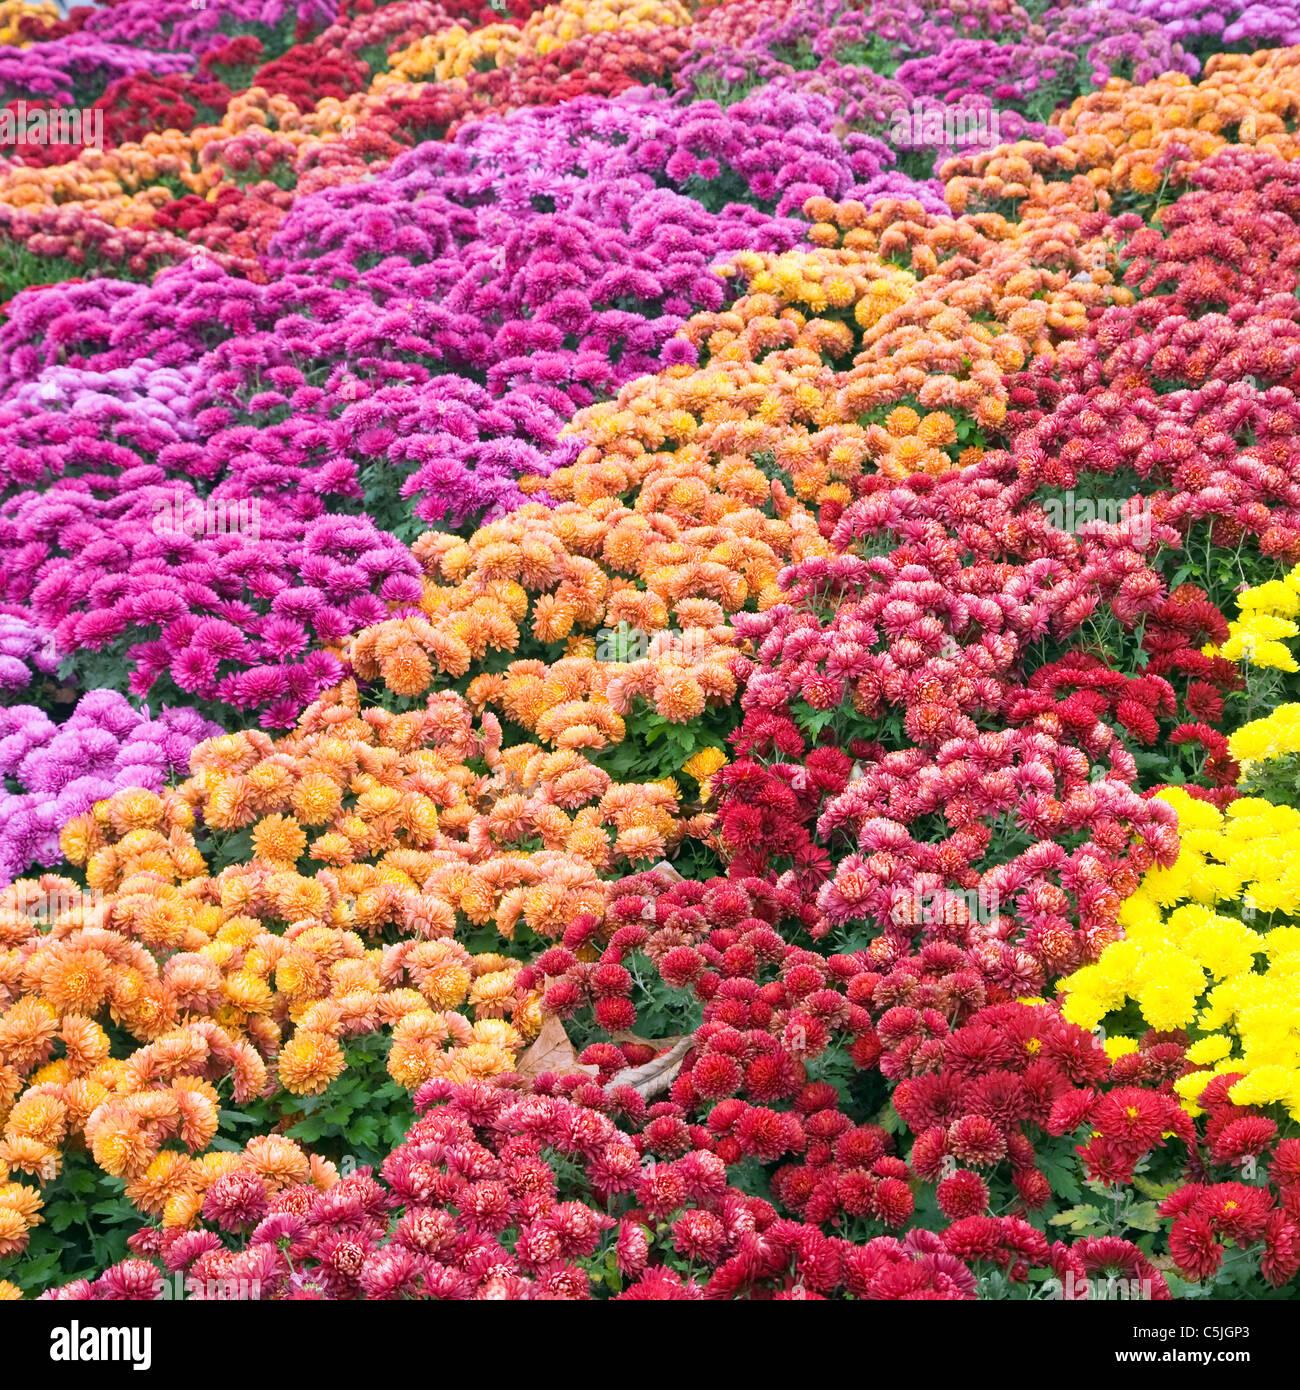 Autumn varicolored chrysanthemum flower bad (striped background) - Stock Image